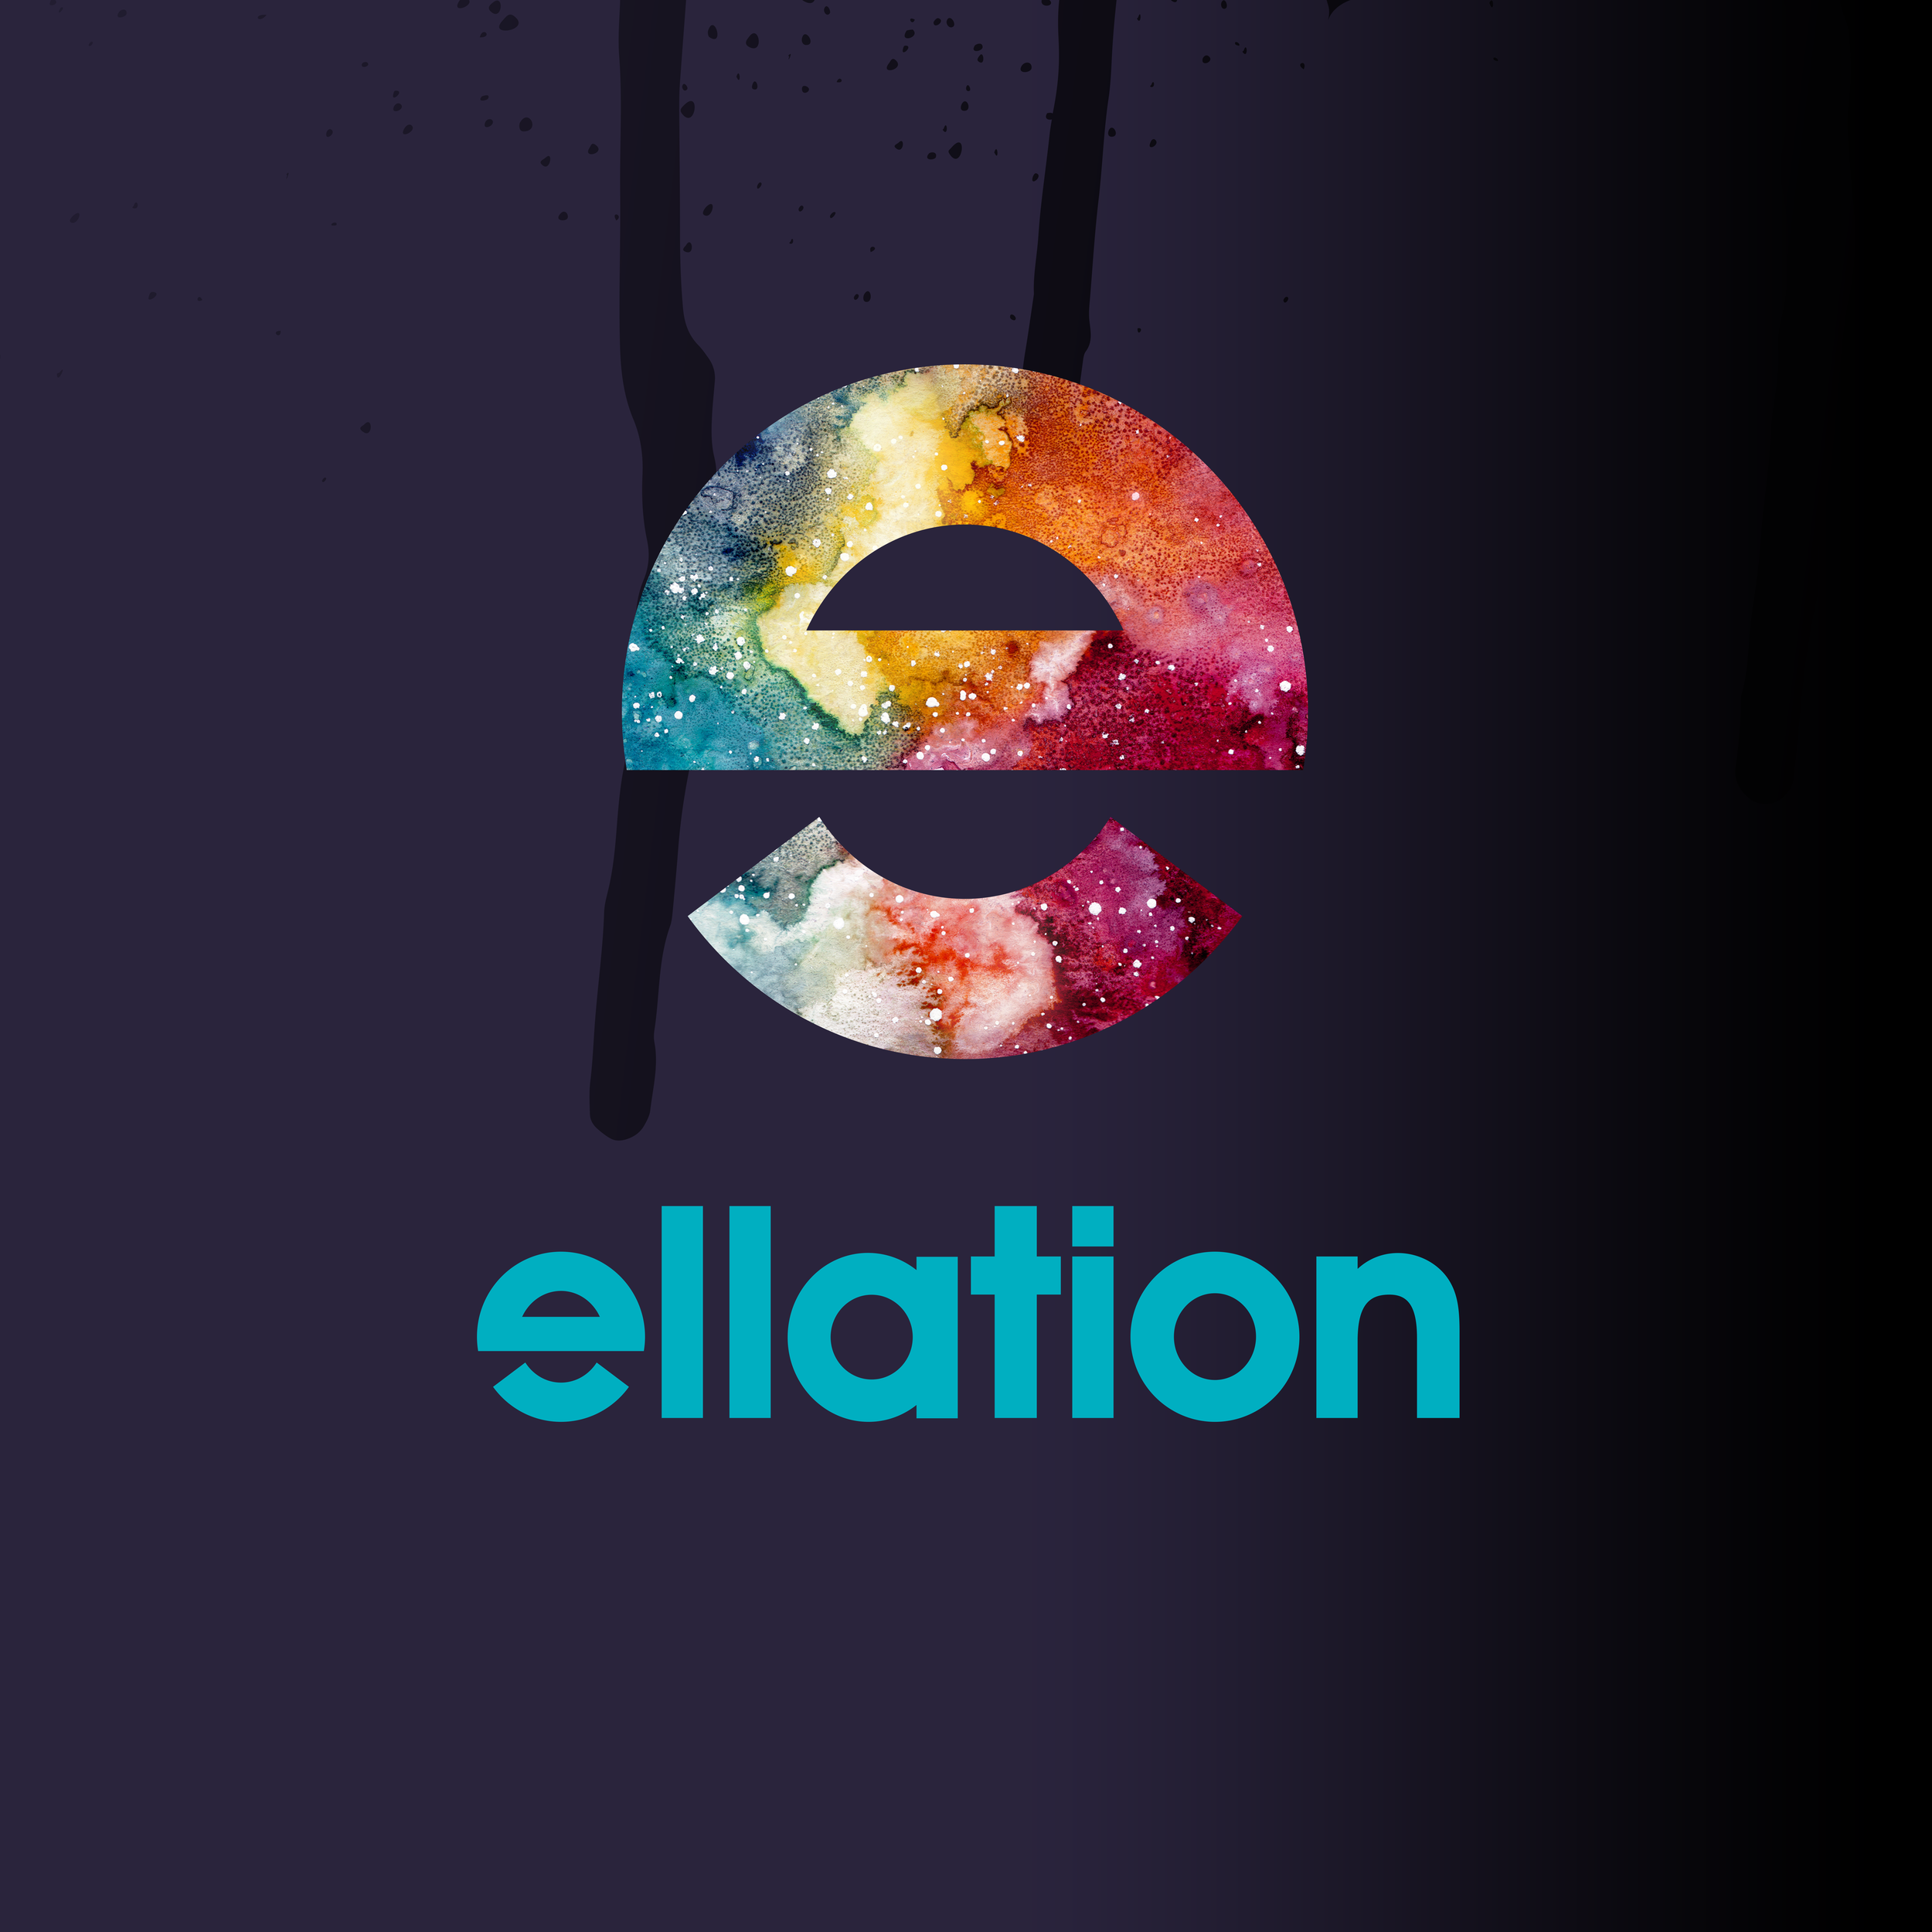 03_Ellation_1x1.png